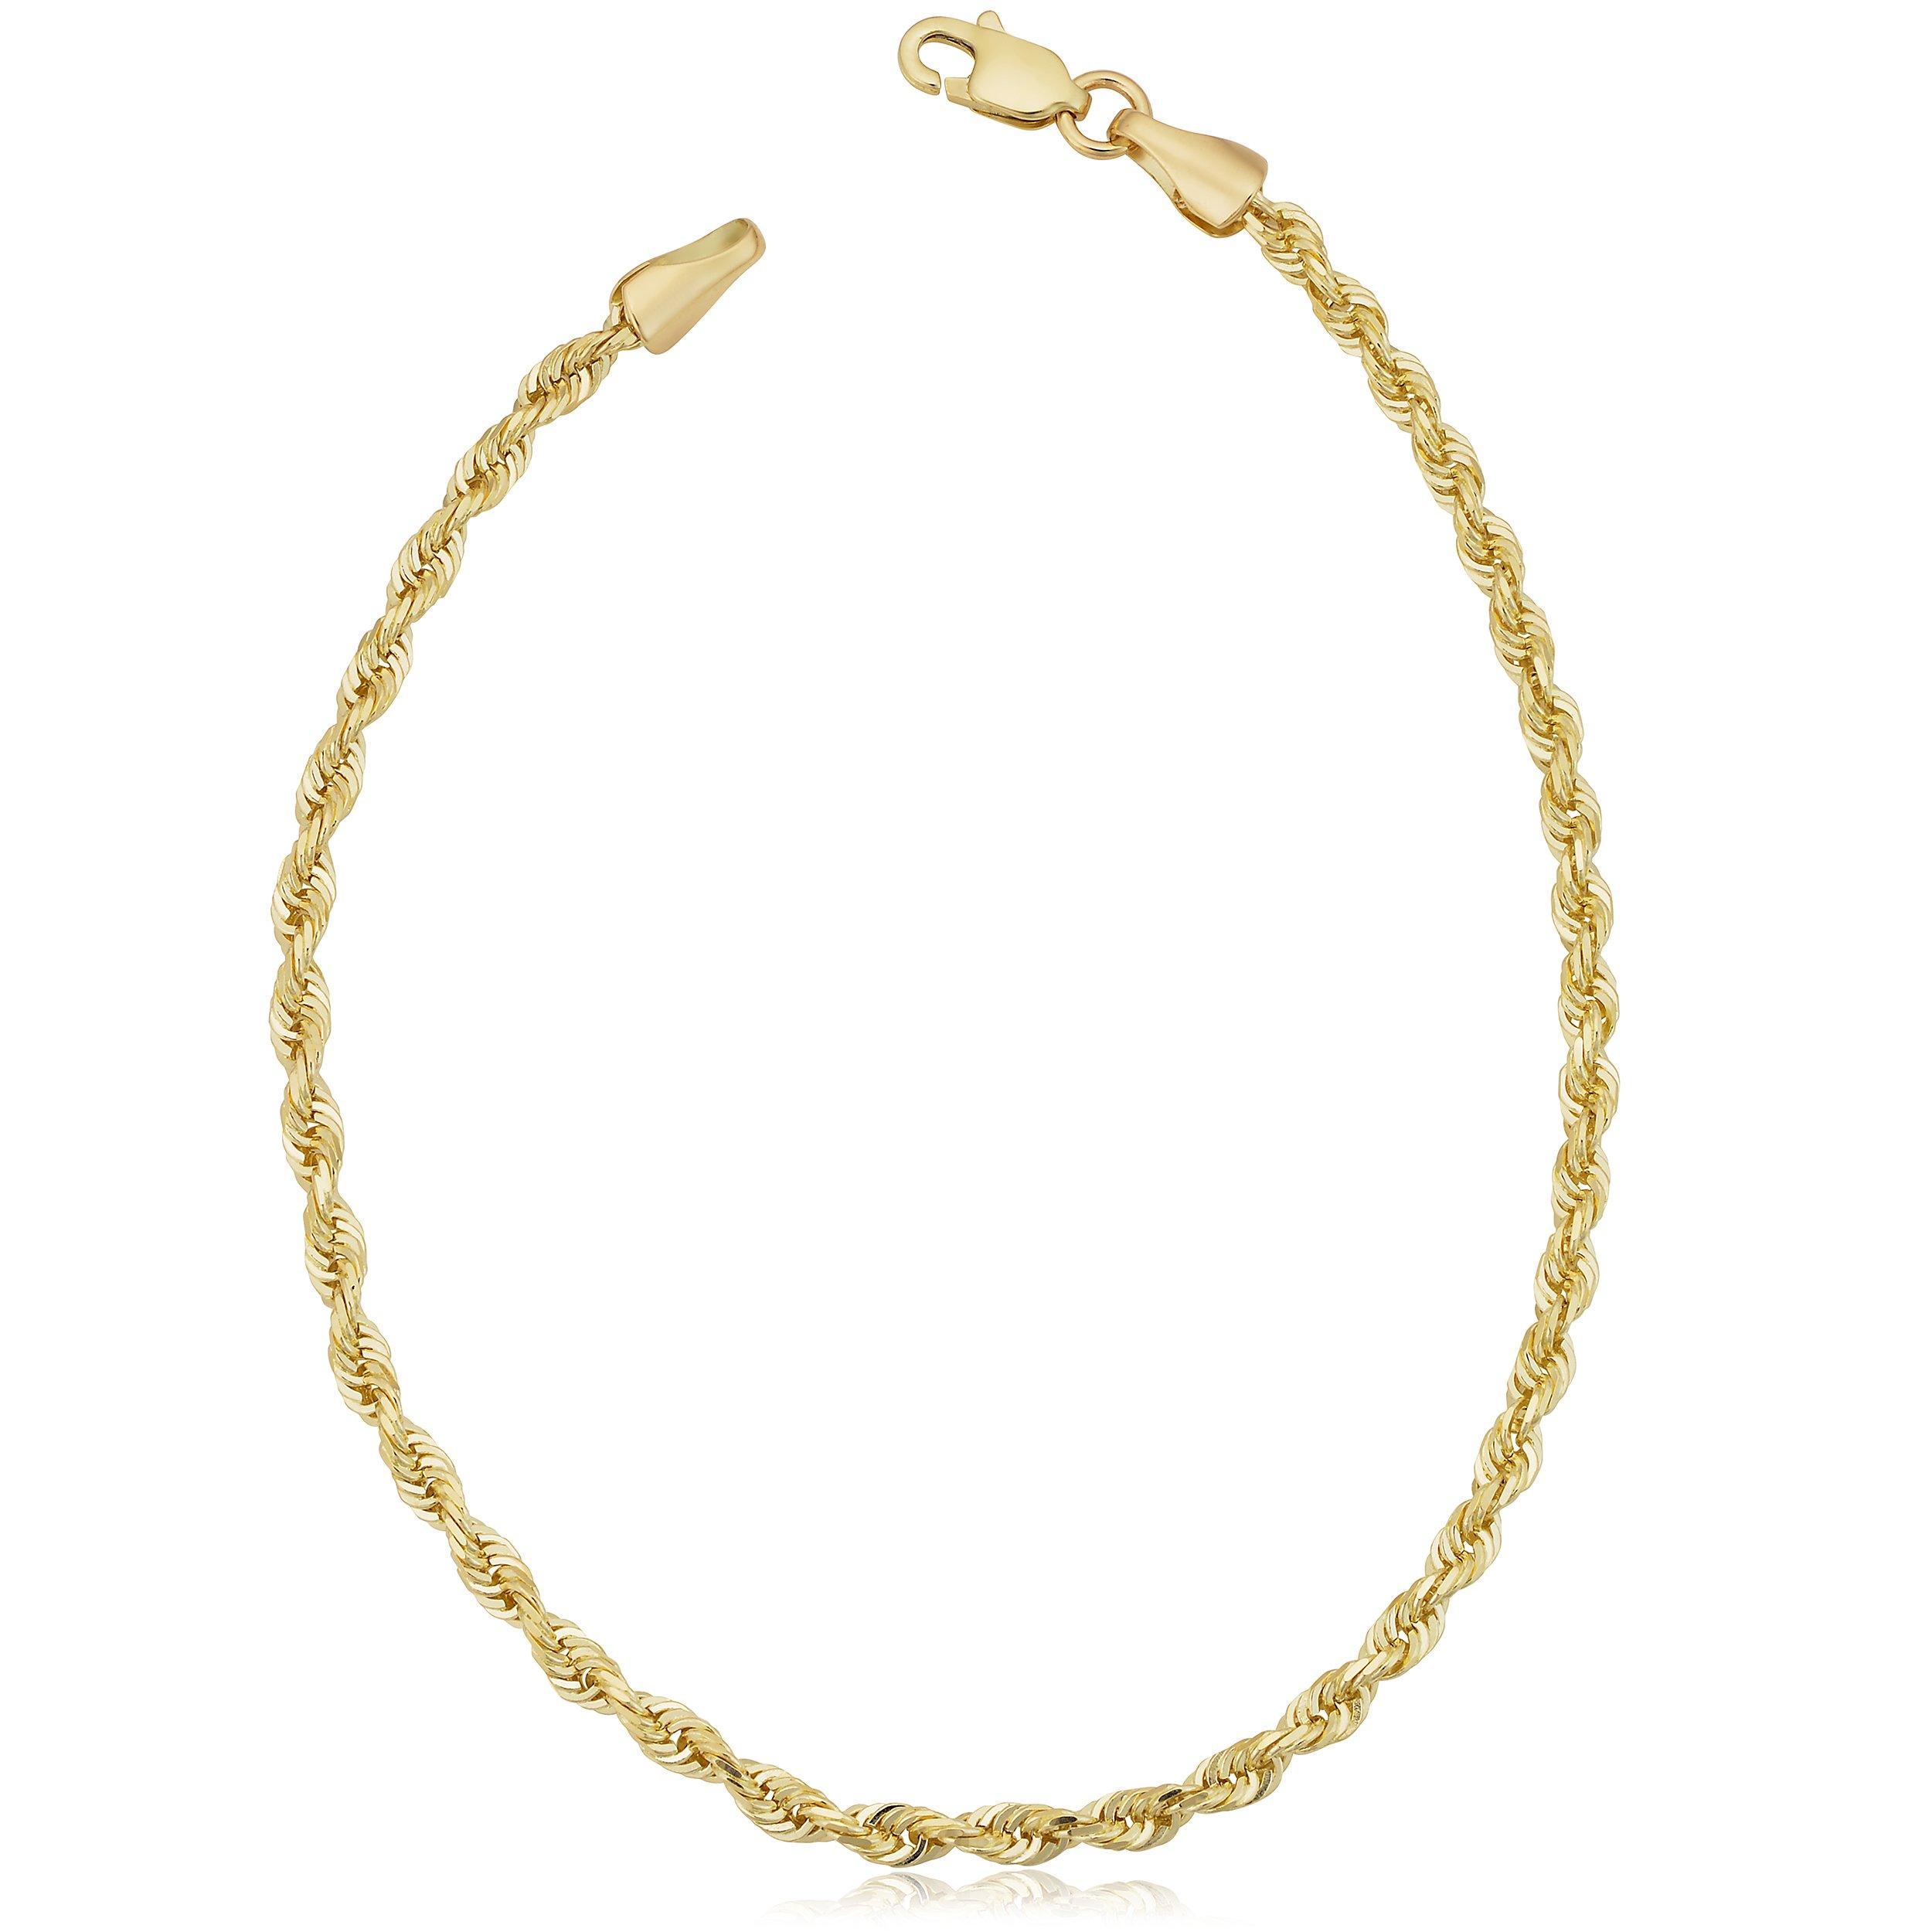 10k Yellow Gold 2.6mm Men's Or Women's Rope Chain Bracelet (8.5 inch)